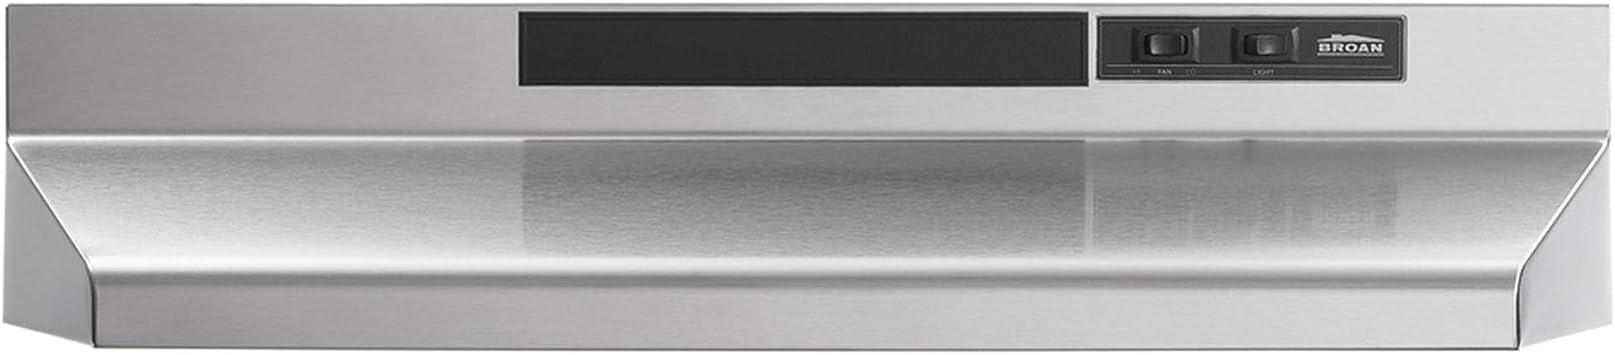 Broan F40000 Series 4-way Convertible Under-Cabinet Range Hood